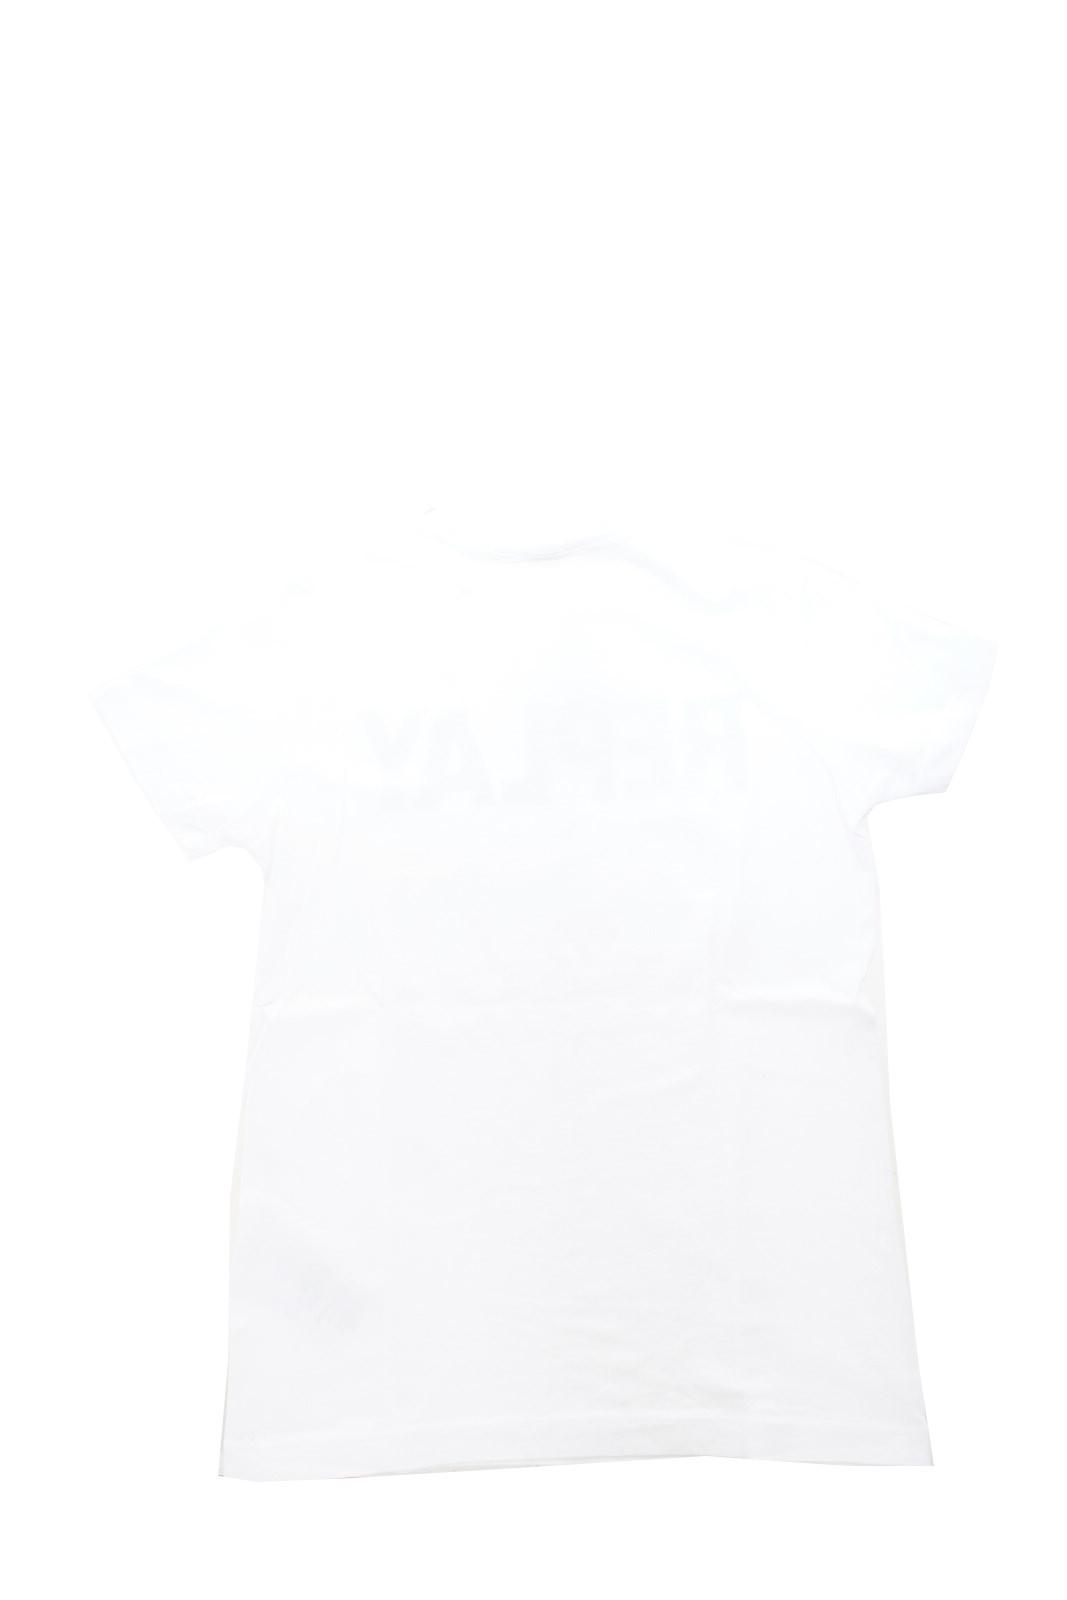 https://www.parmax.com/media/catalog/product/a/i/PE-outlet_parmax-t-shirt-bambino-Replay-SB73080102660-B.jpg